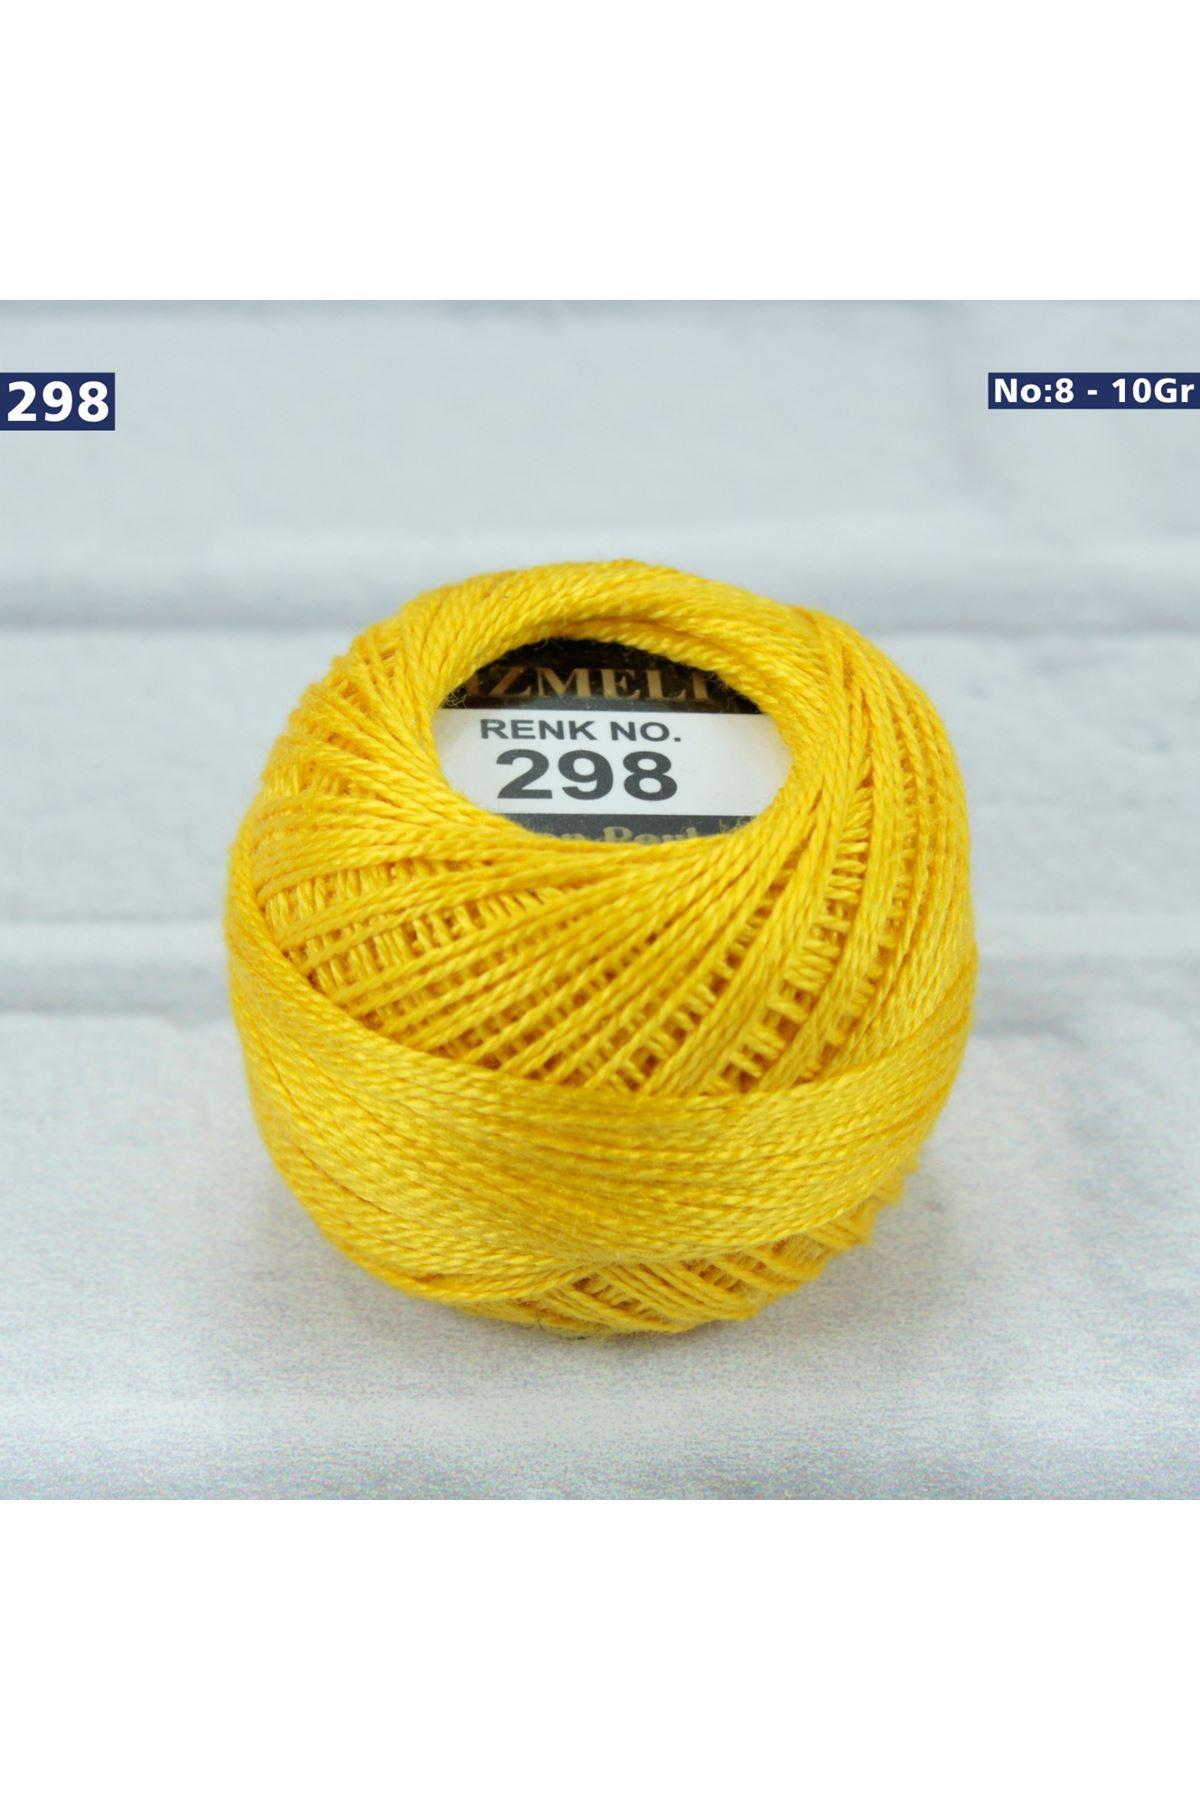 Çizmeli Cotton Perle Nakış İpliği No: 298